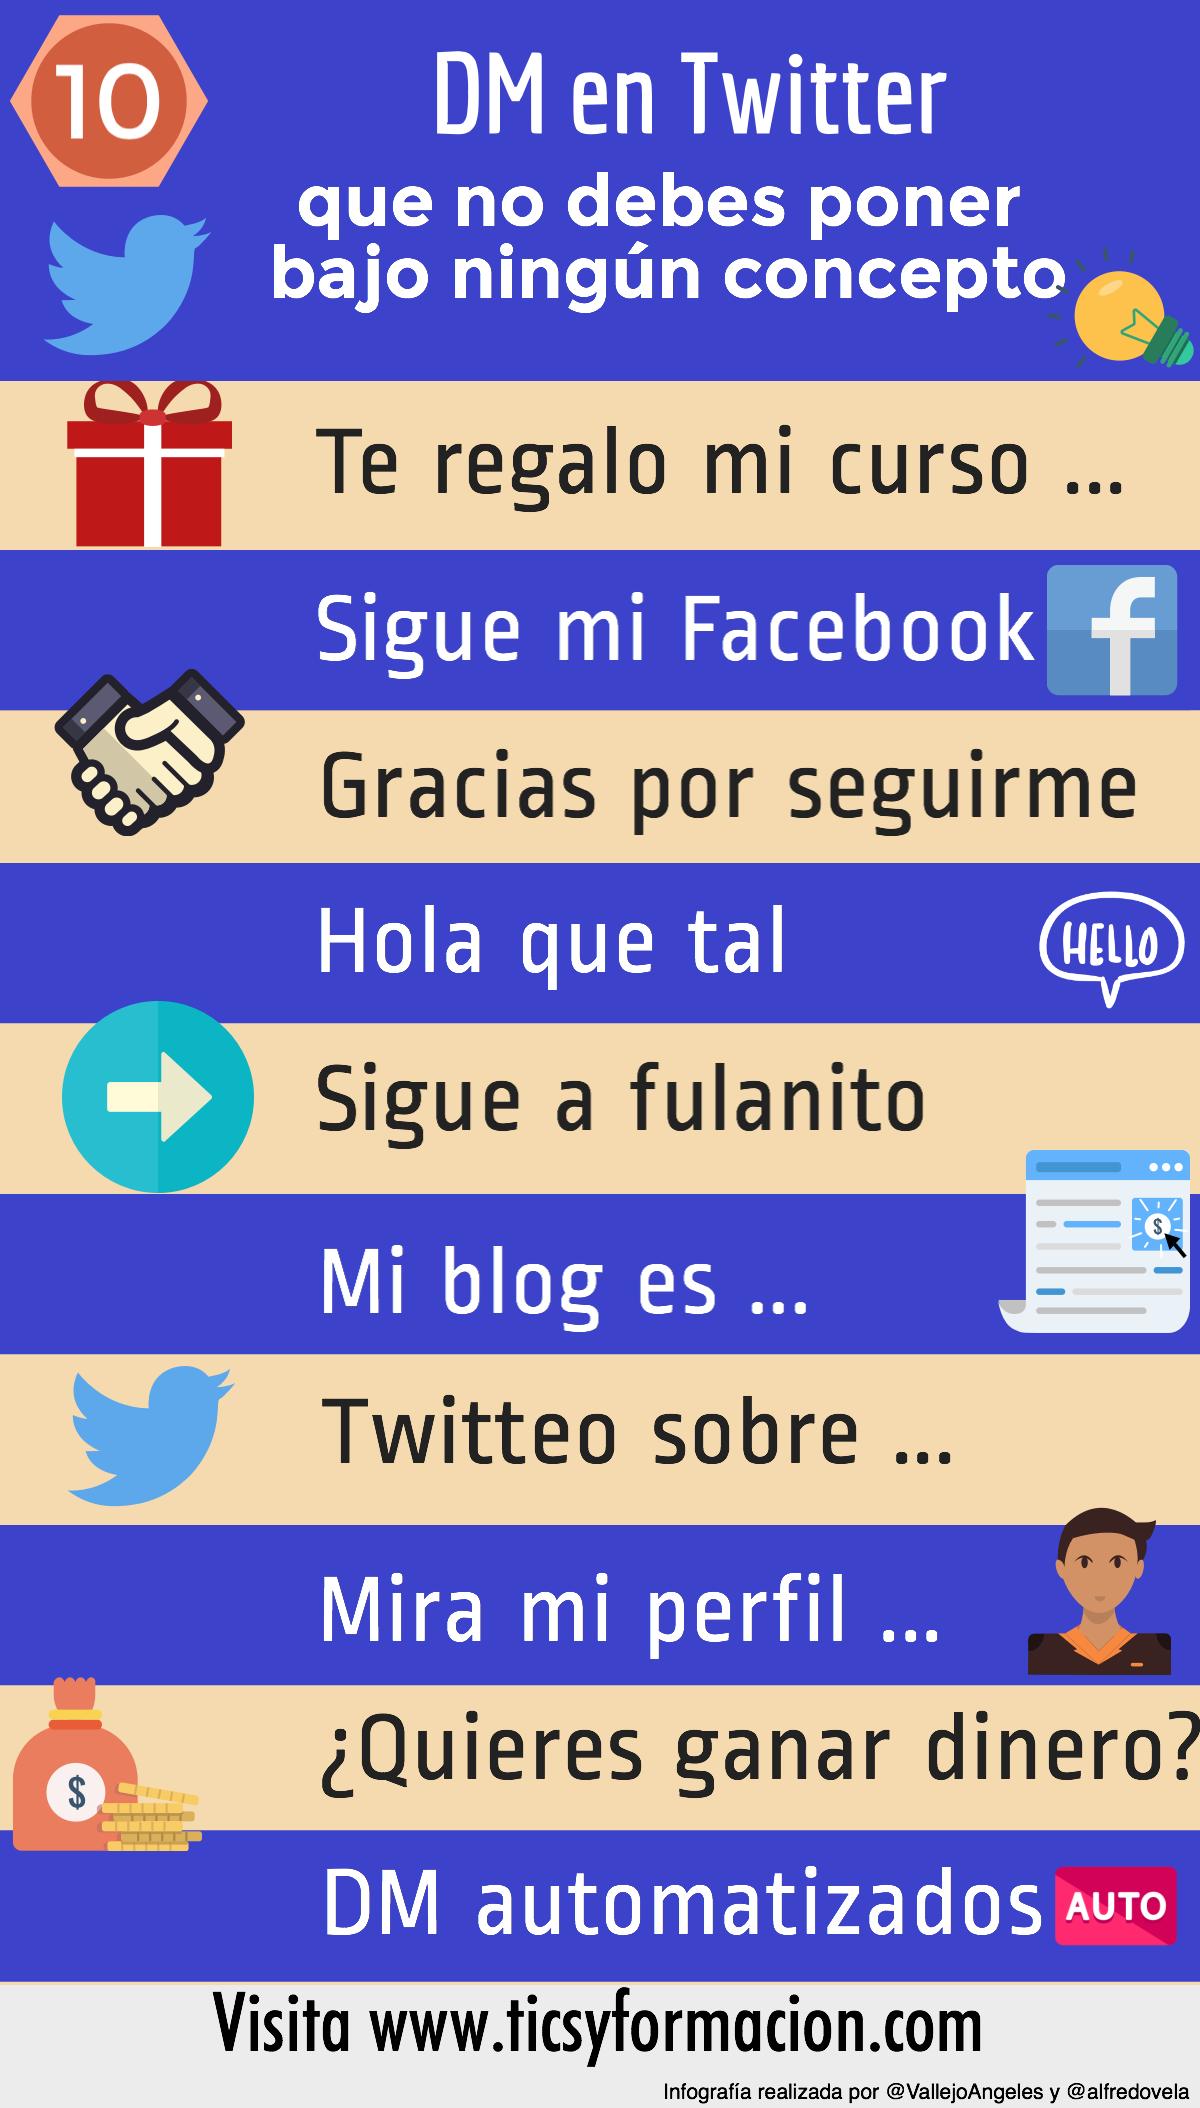 10 DM en Twitter que NO debes poner bajo ningún concepto #infografia #socialmedia